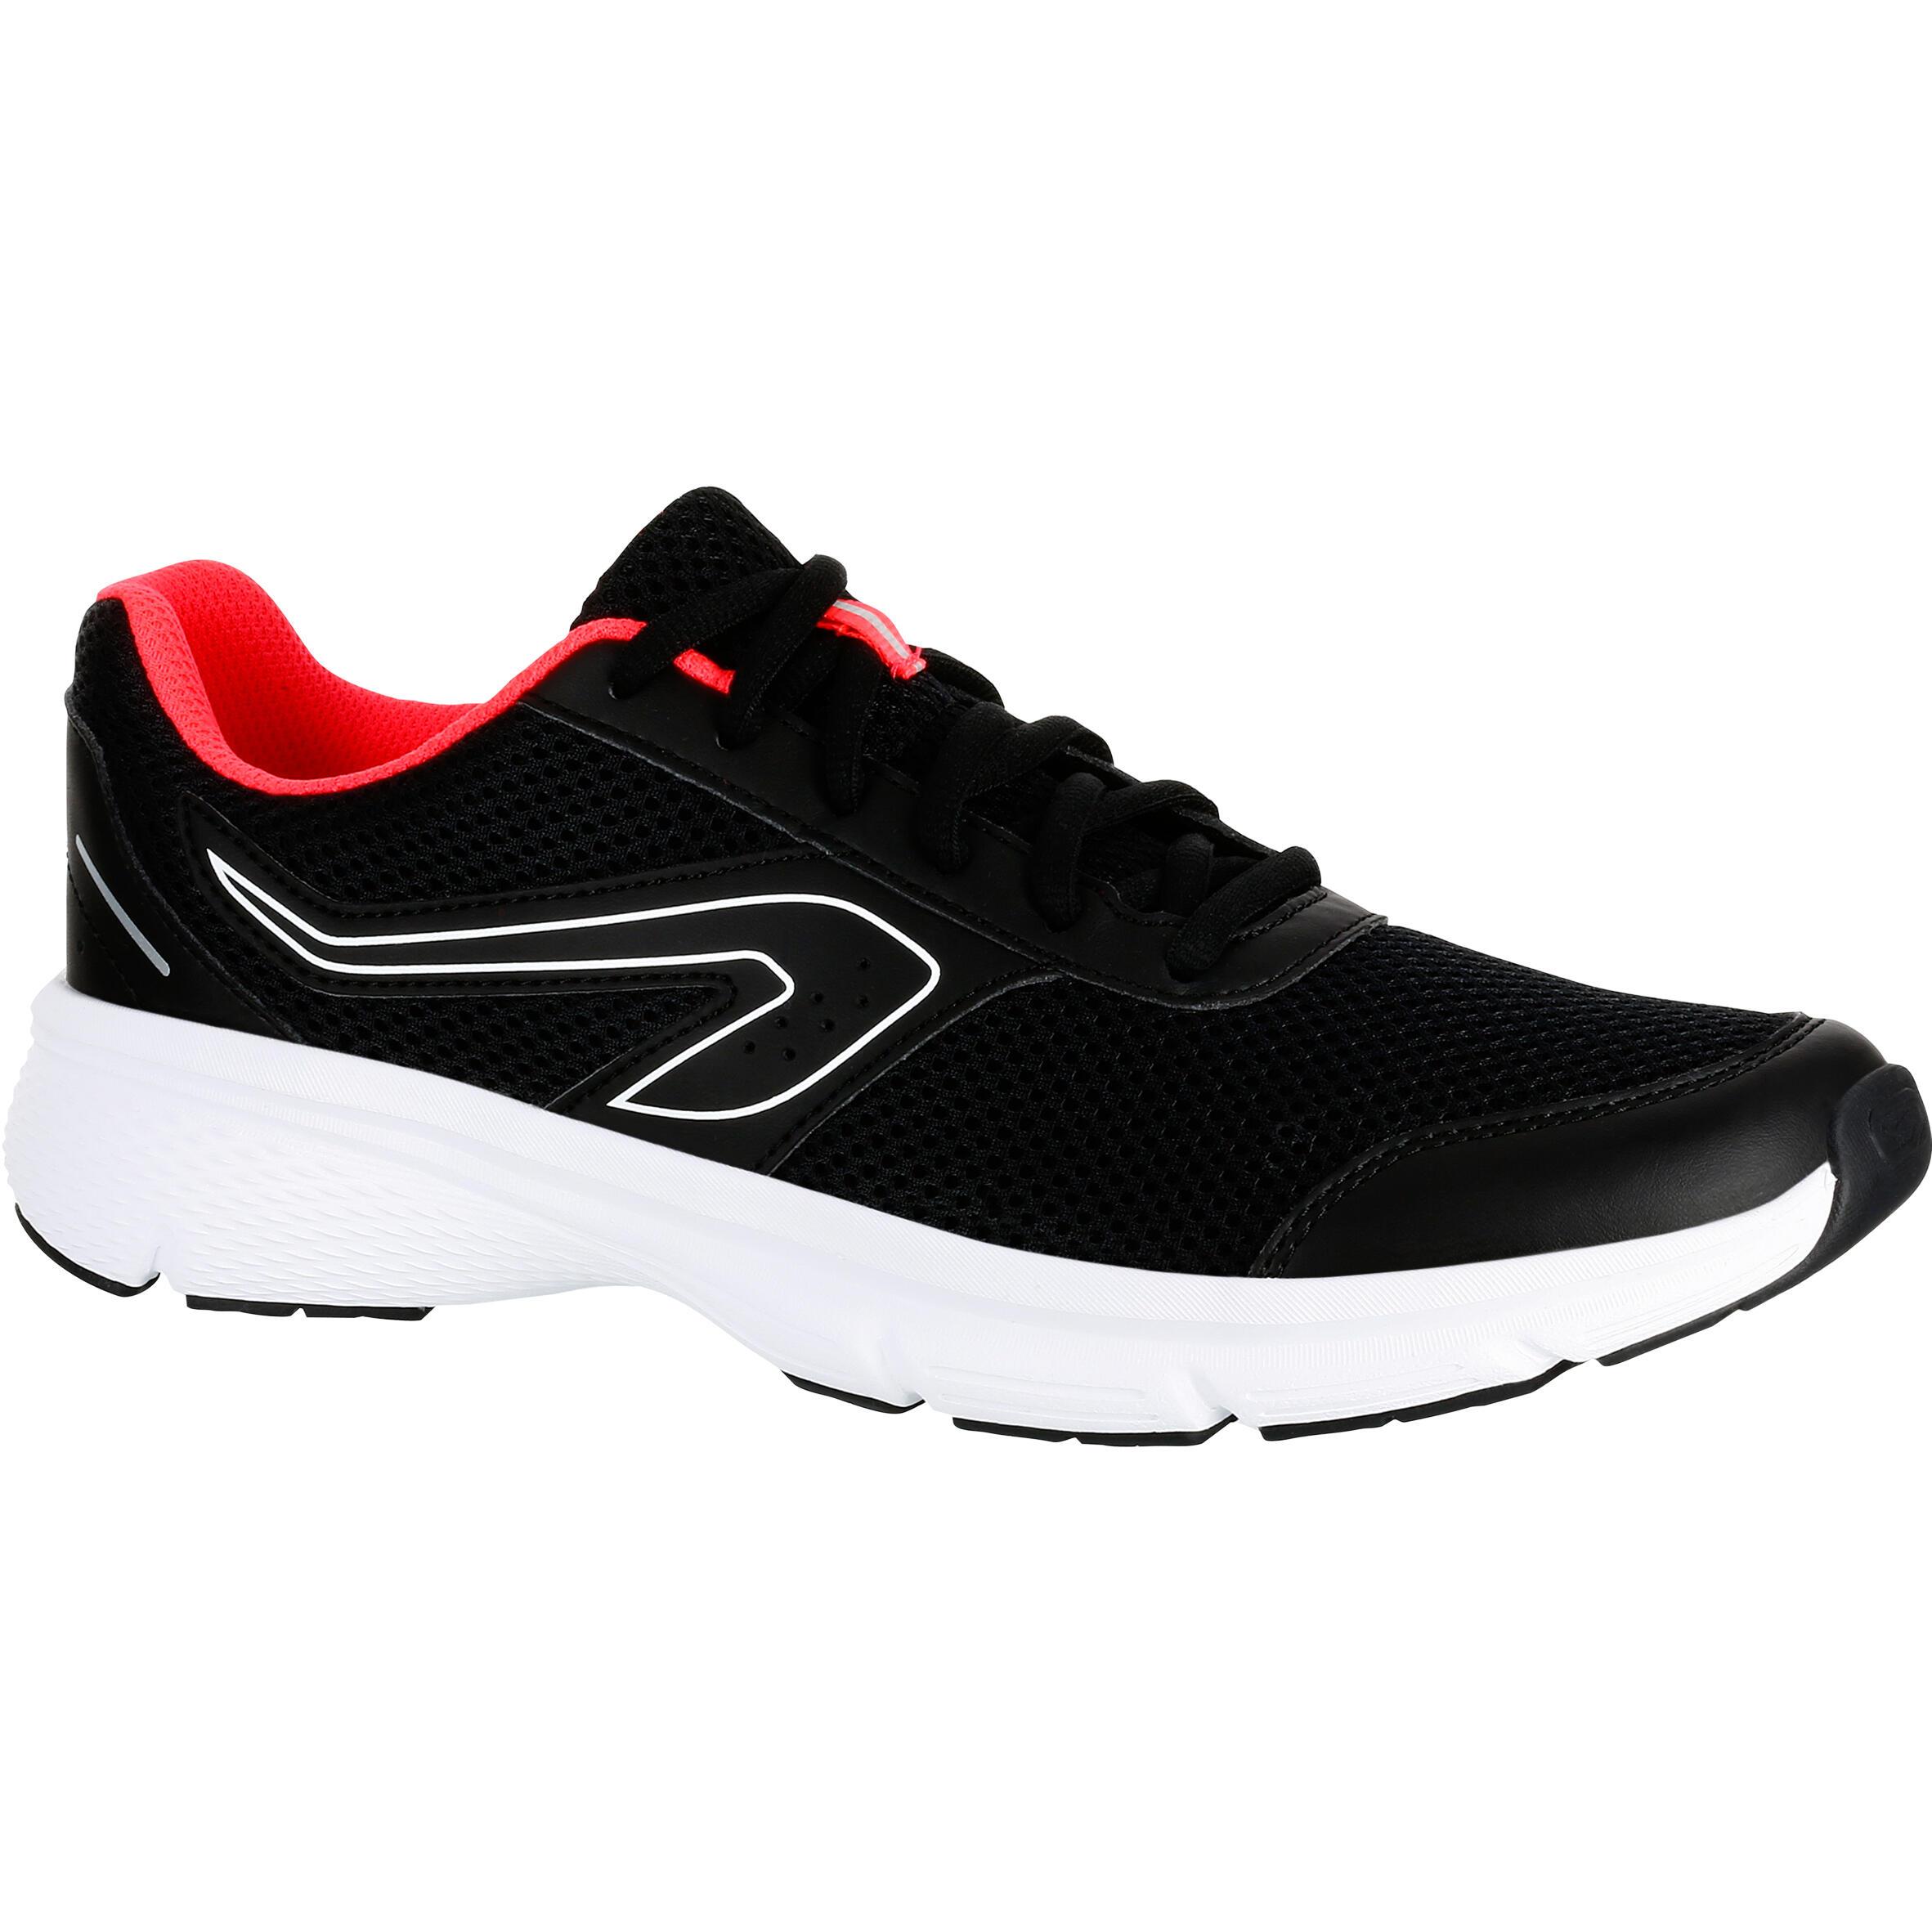 Laufschuhe Run Cushion Damen | Schuhe > Sportschuhe > Laufschuhe | Kalenji